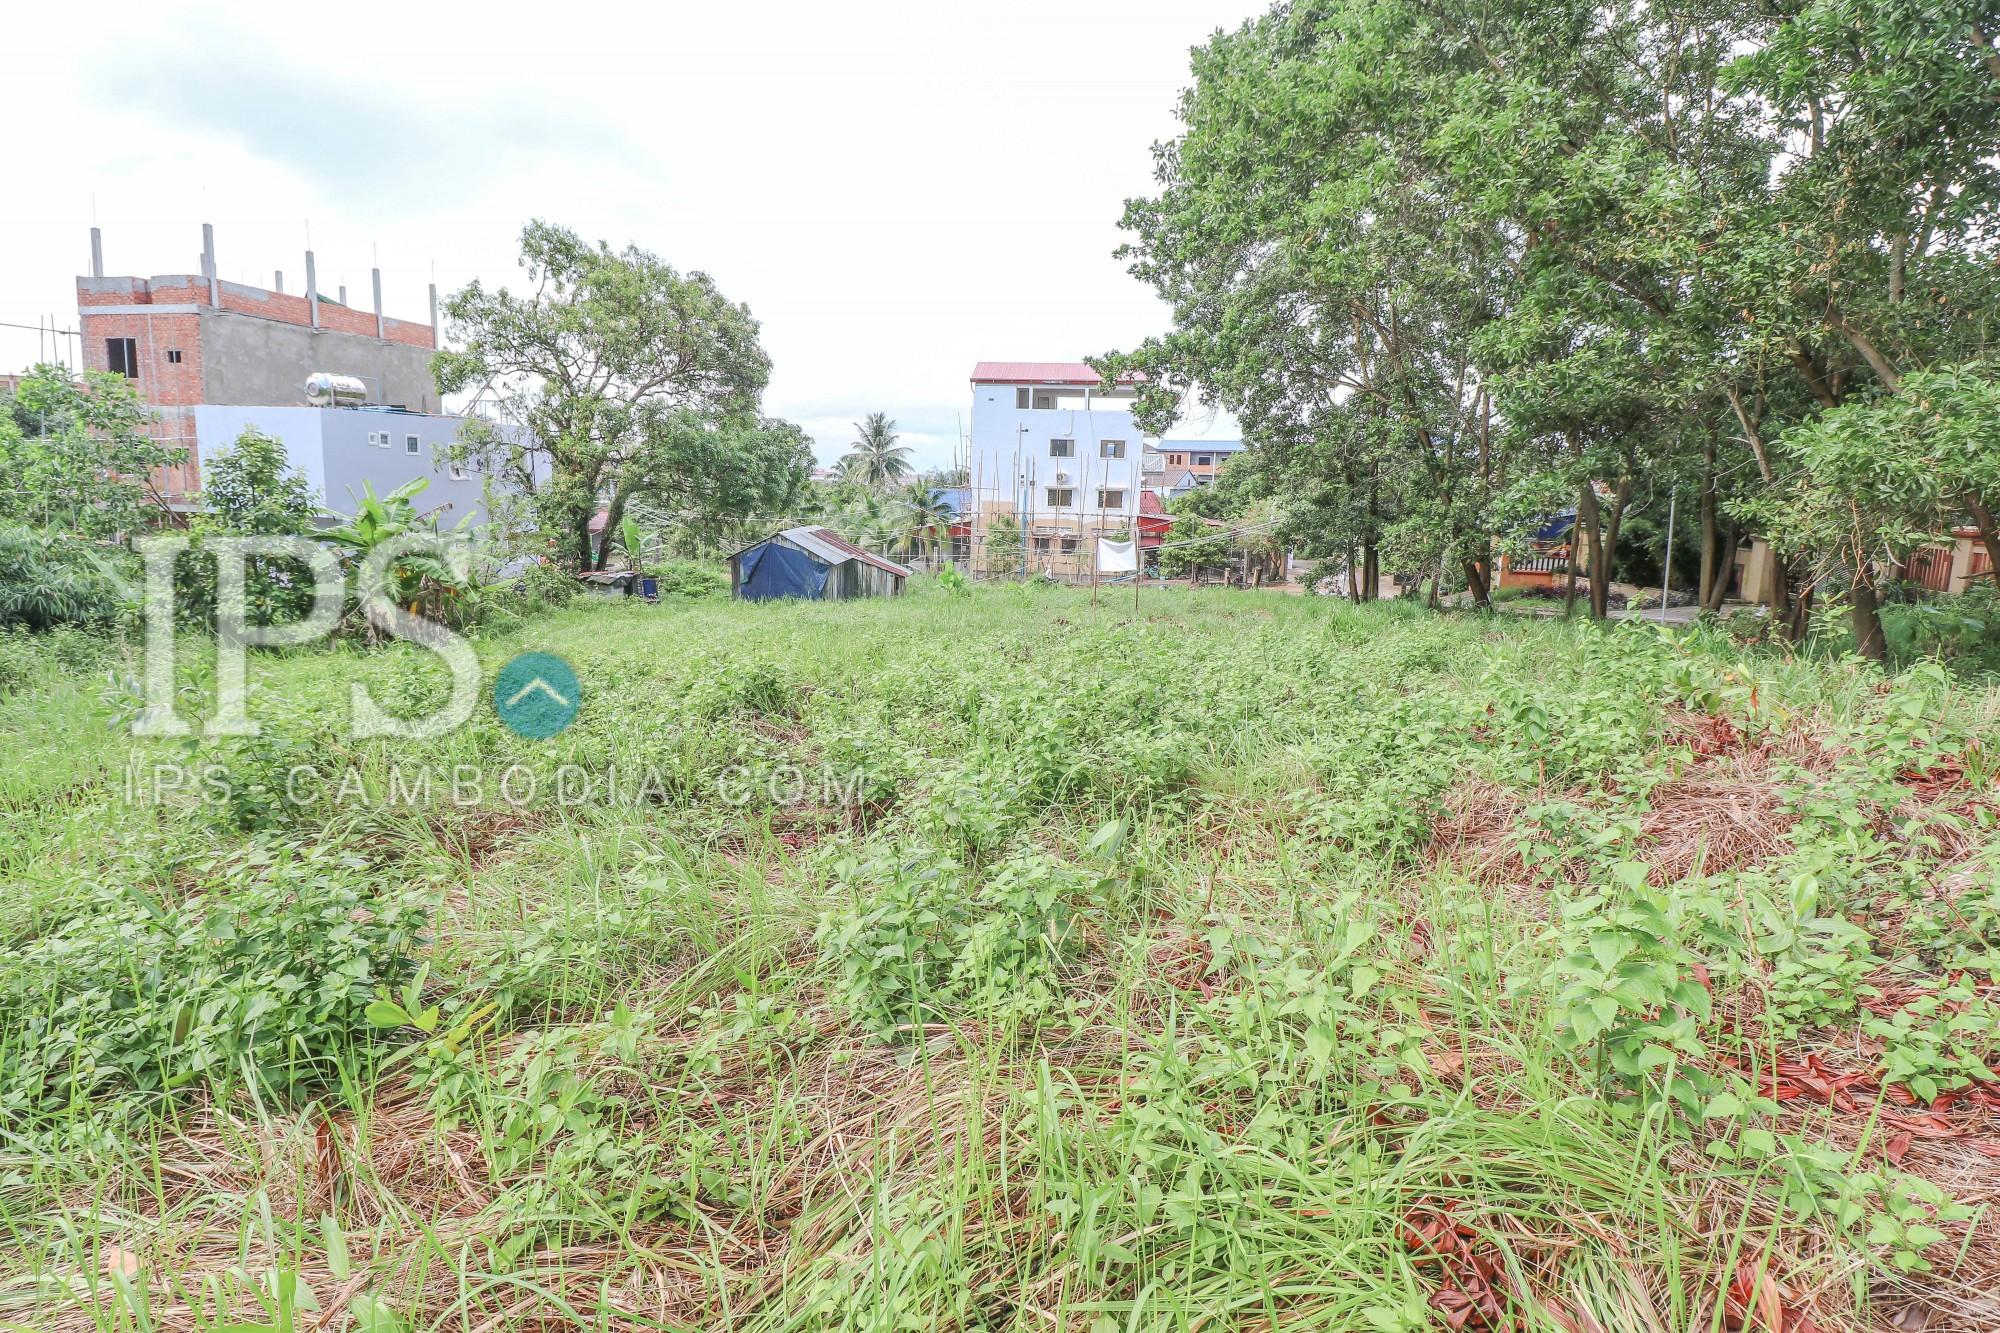 Land Property for Sale - Mittapheap, Sihanoukville